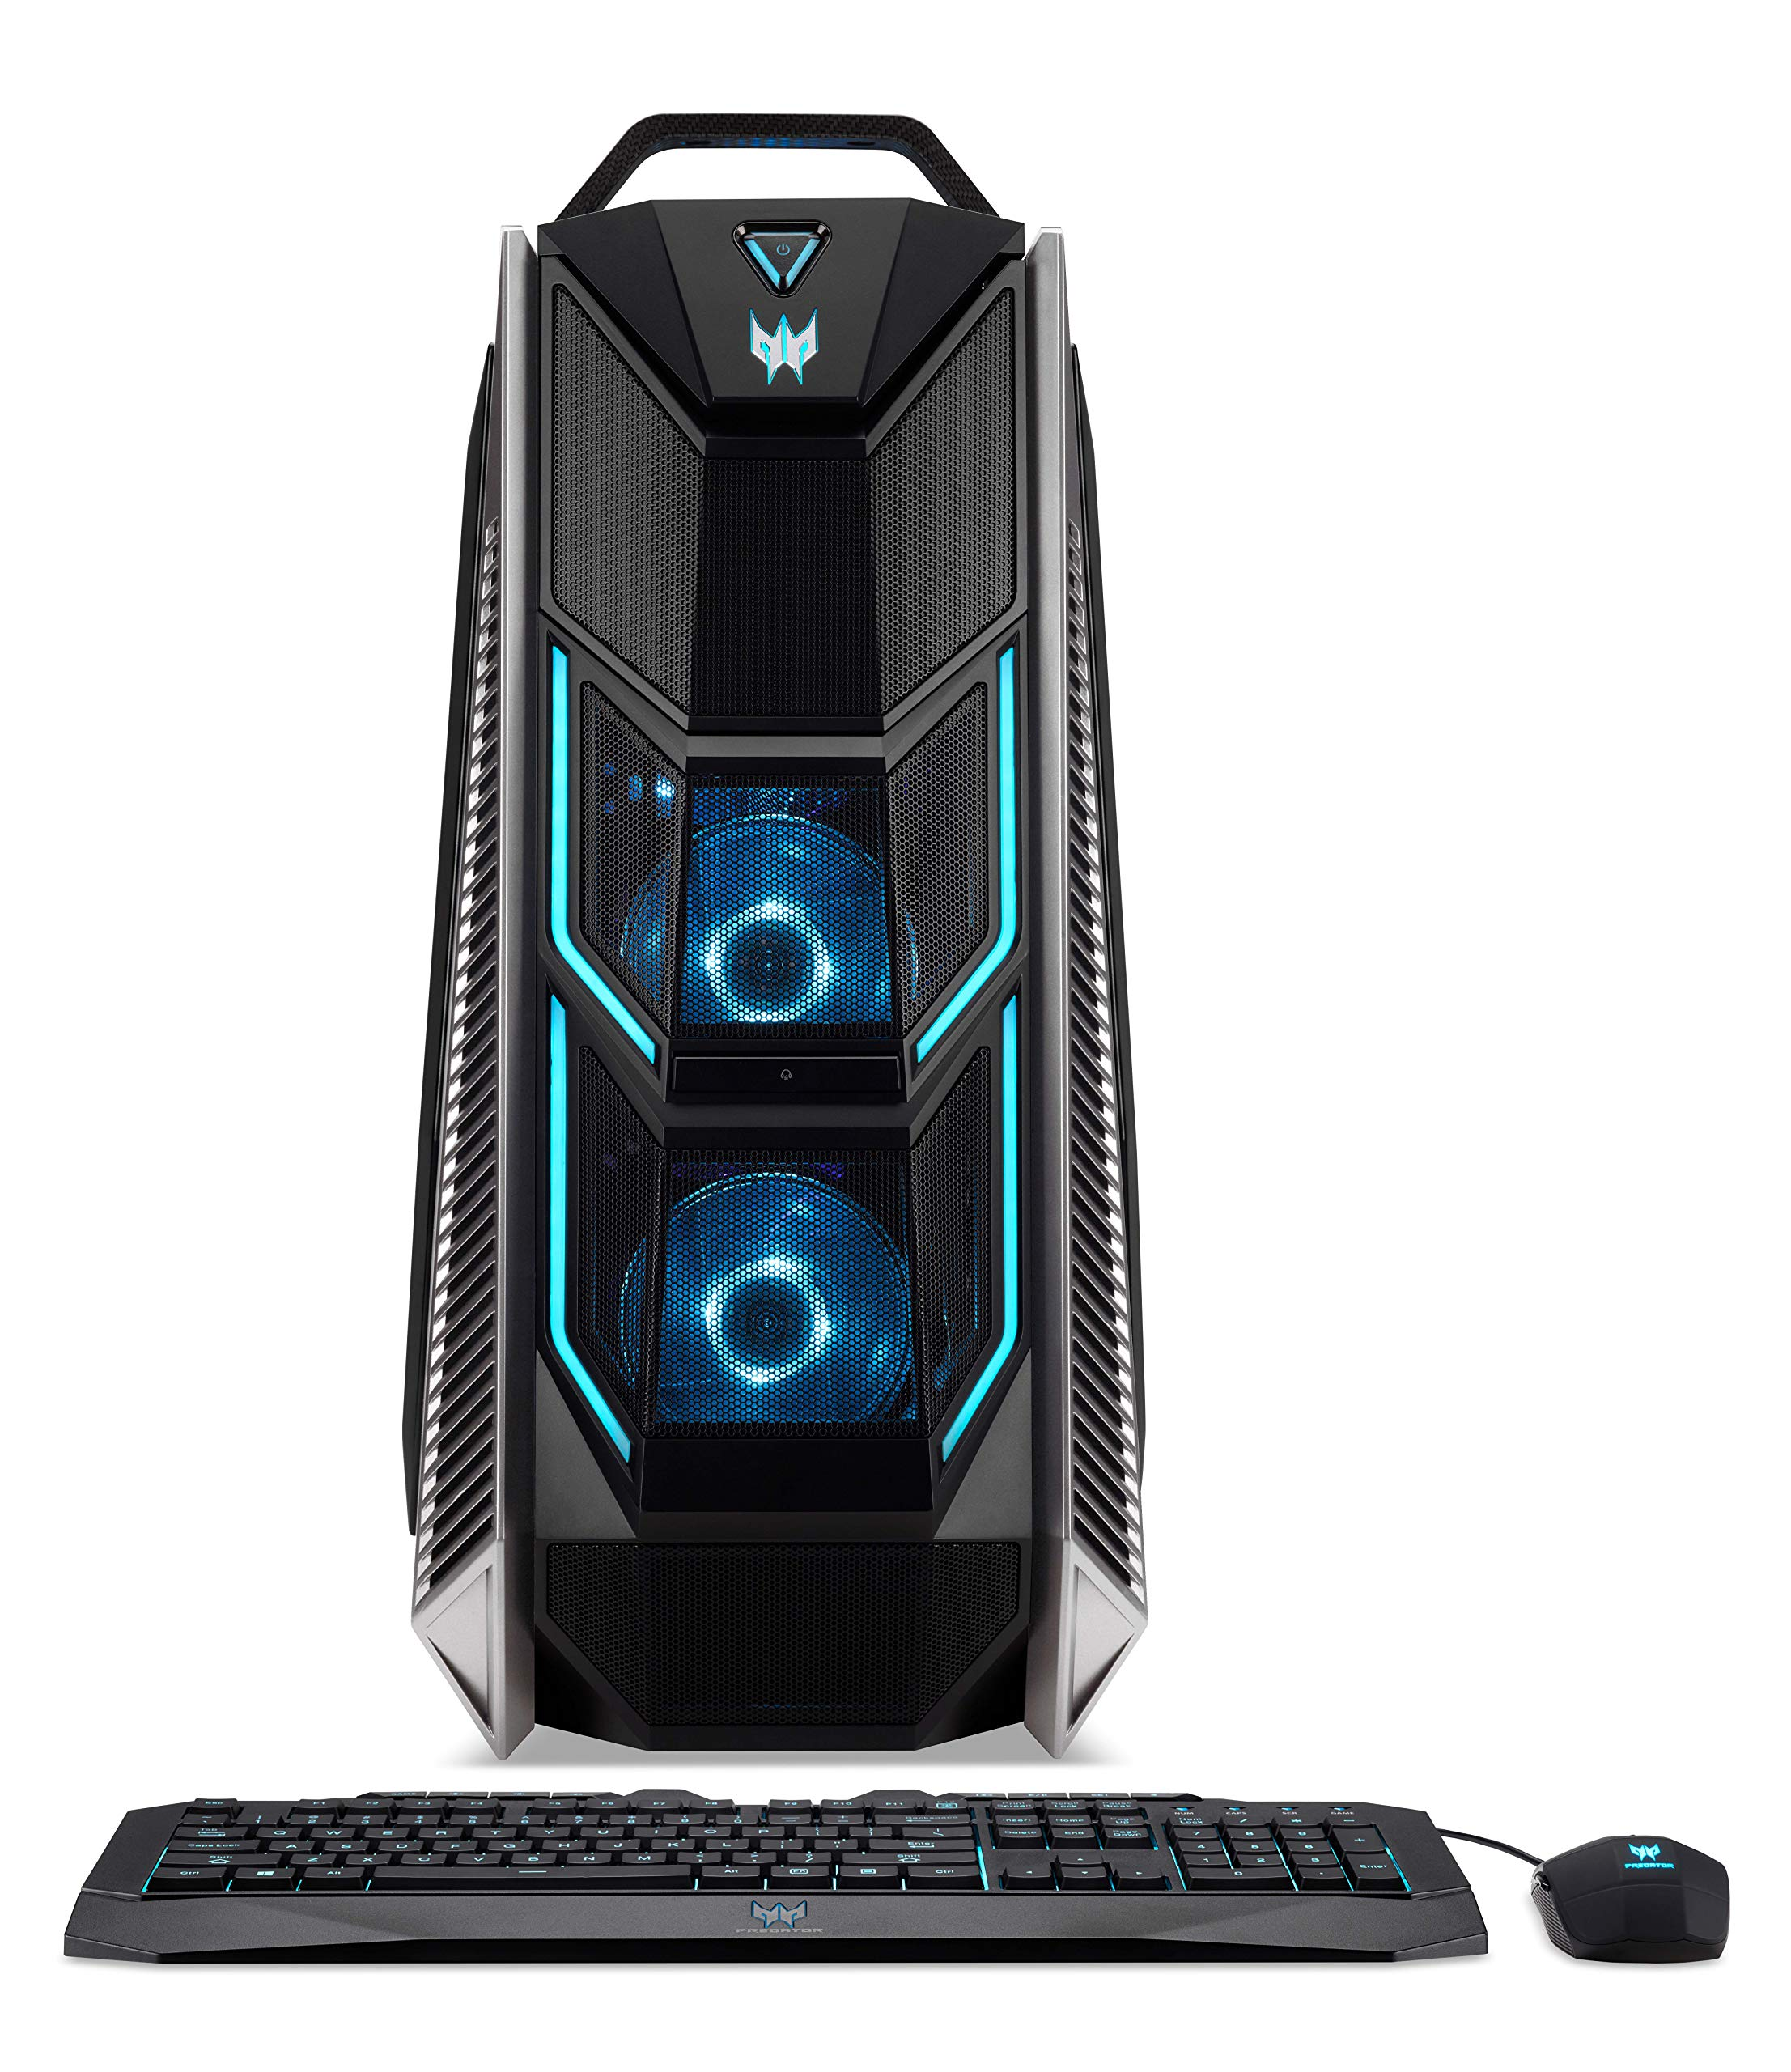 Predator Orion 9000 (P09-900) Desktop PC (Intel Core i9-7980XE, 64 GB RAM, 2x 512 GB PCIe SSD, 2x 256 GB SSD, 2x NVIDIA…